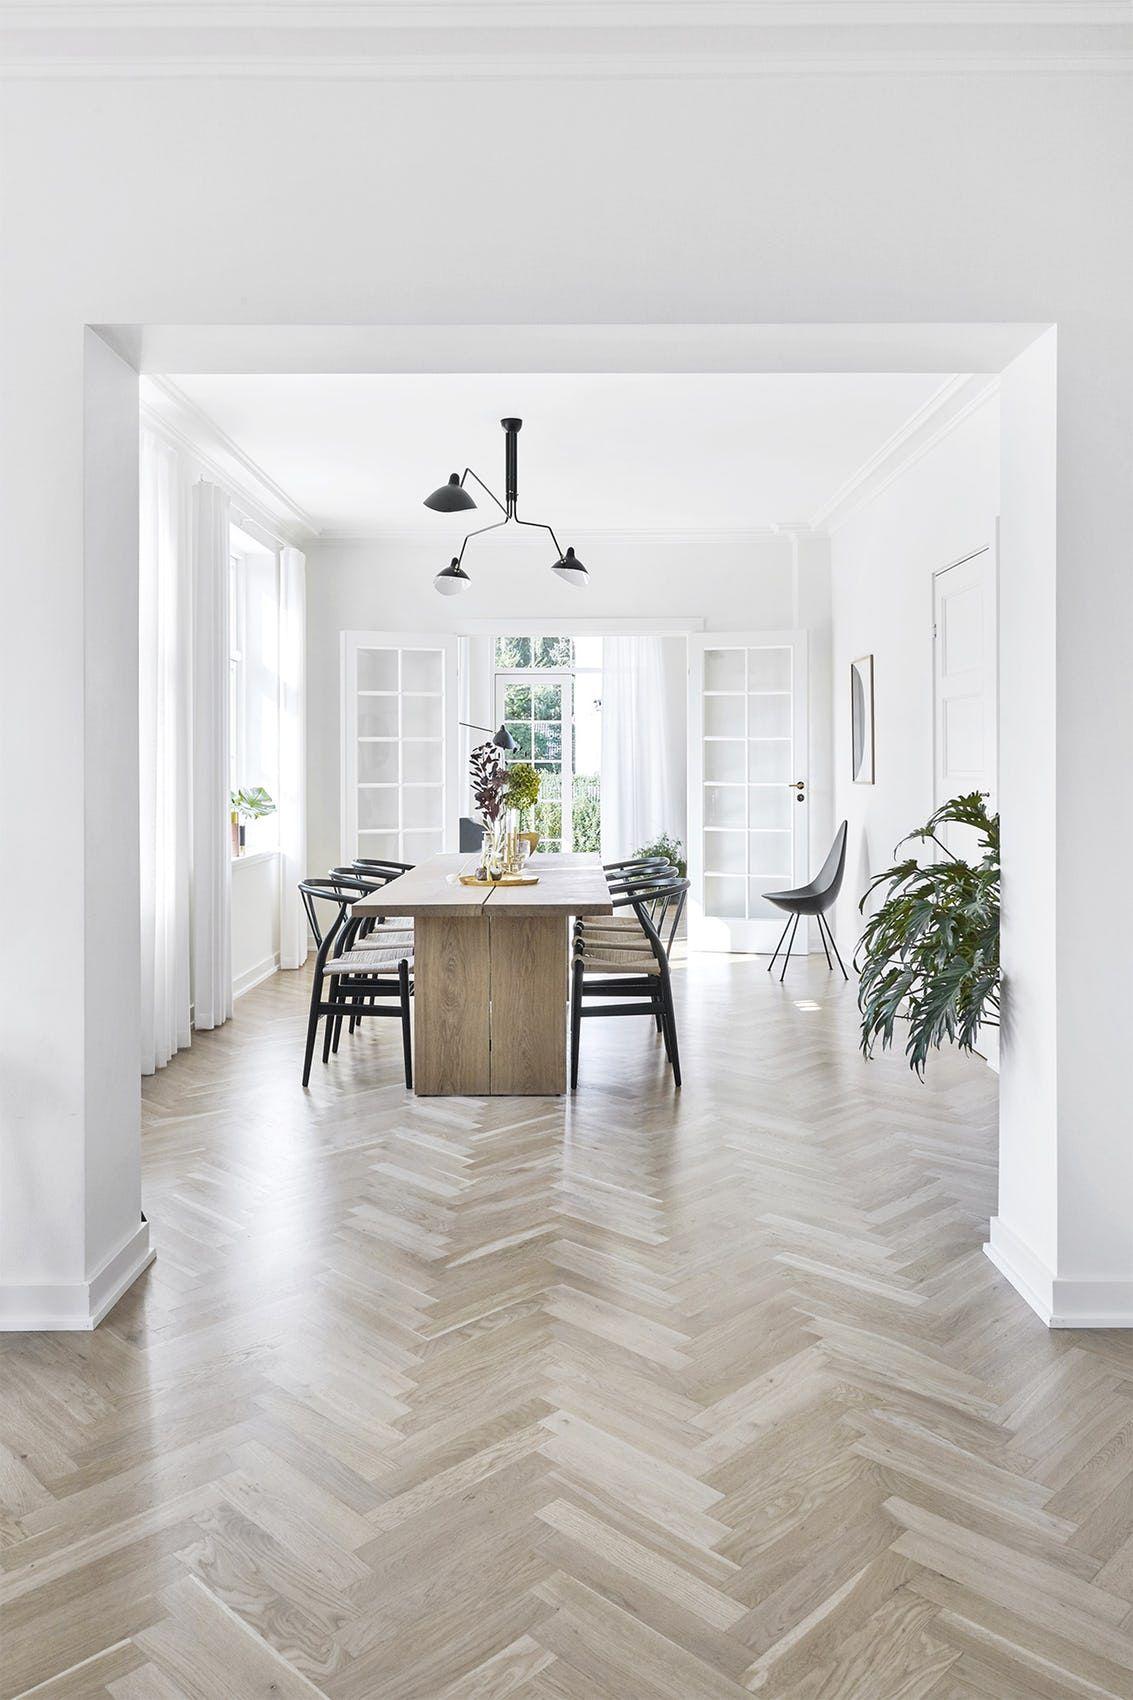 spisestue indretning Smuk villa med skarpe detaljer | New Home | Pinterest | Interiors  spisestue indretning